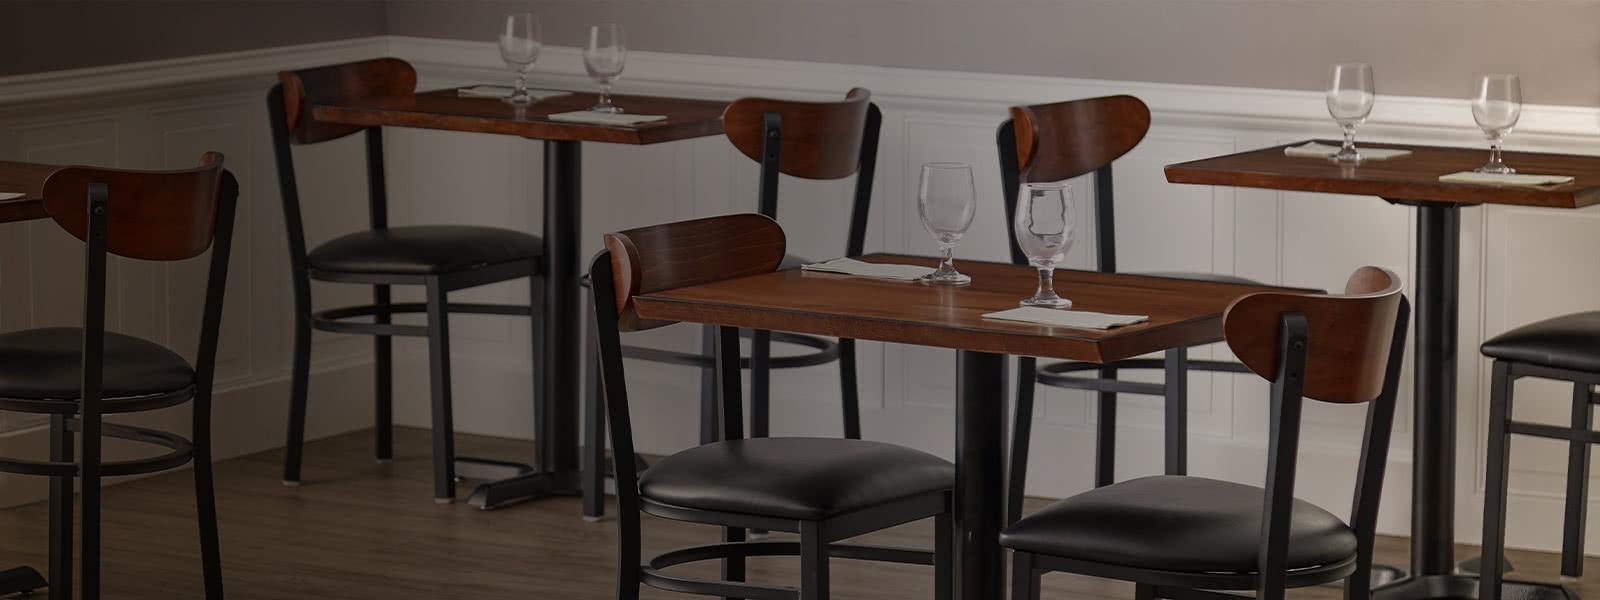 Restaurant Tables Dining Tops